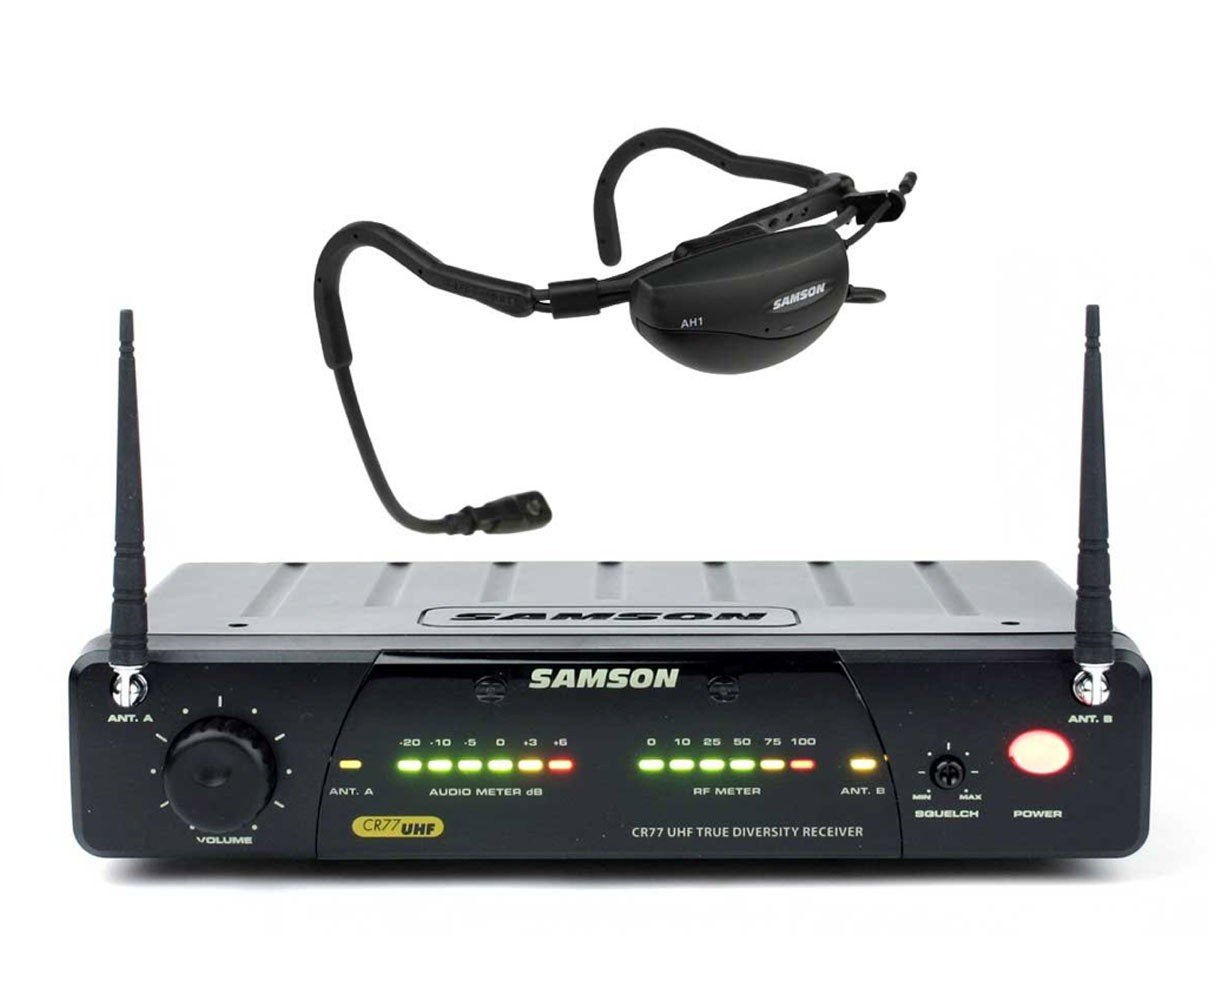 Samson AIRLINE 77 UHF Aerobics Headset System - E1 (863.125 MHz)